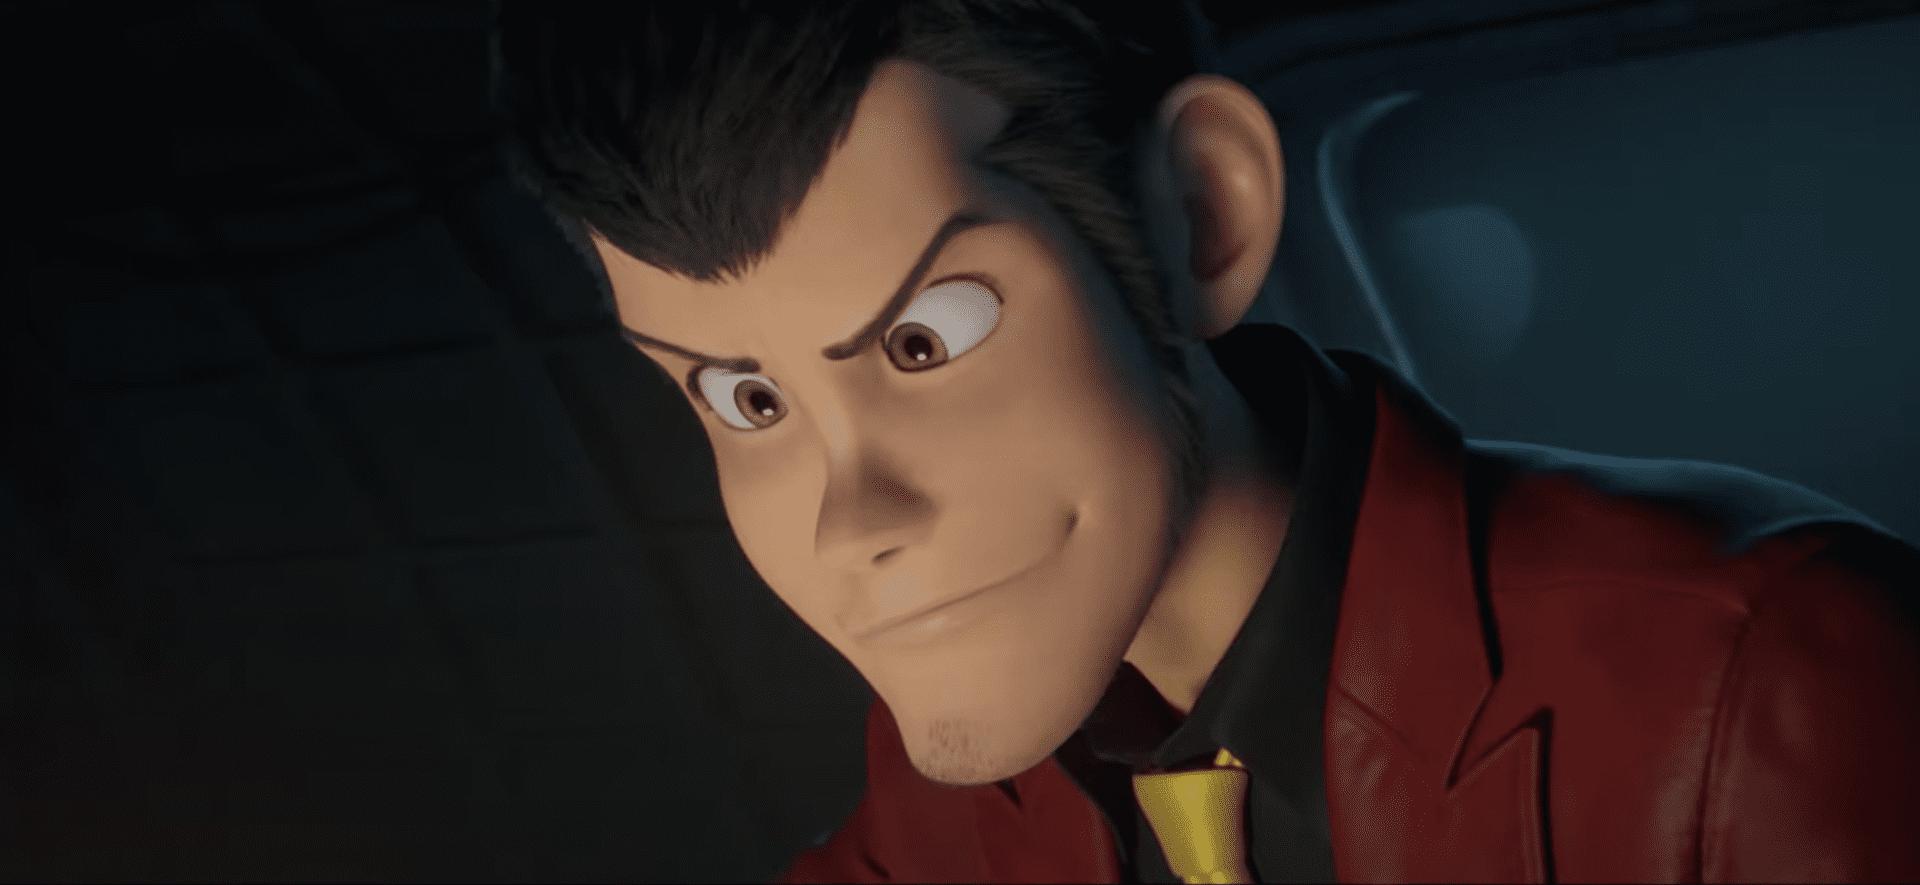 Lupin III The First, English dub teaser trailer